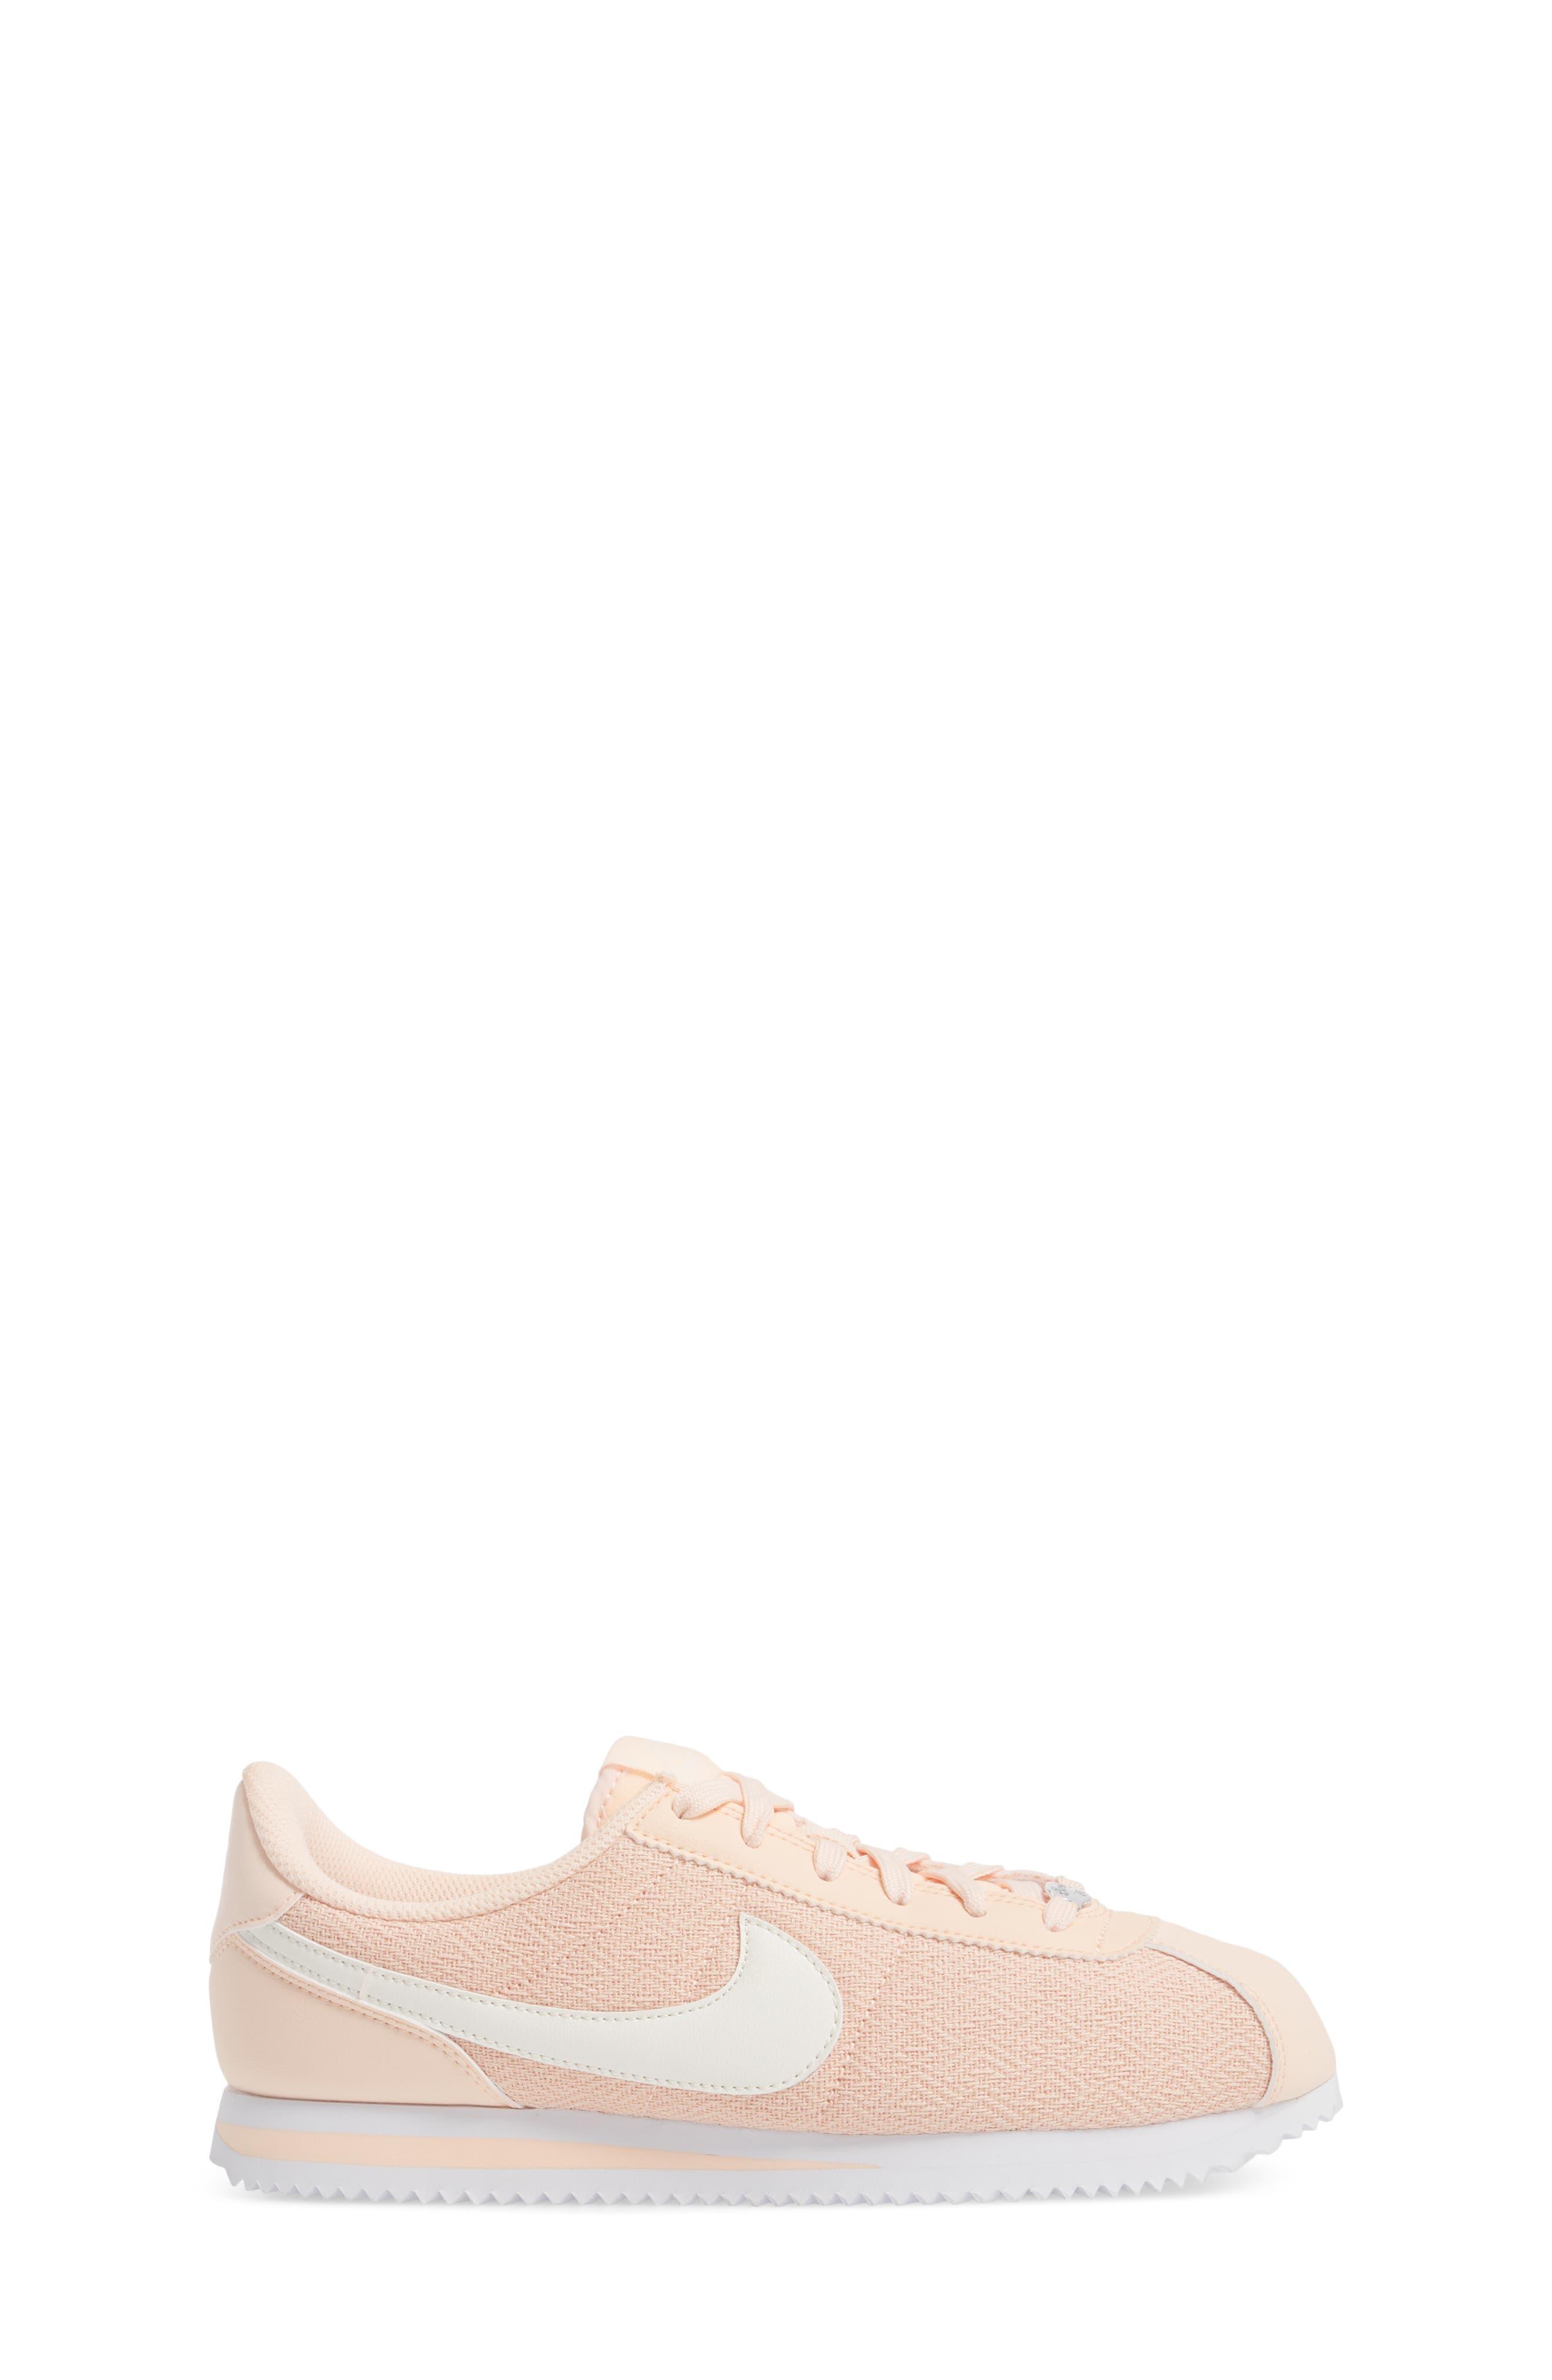 Cortez Basic TXT SE Sneaker,                             Alternate thumbnail 3, color,                             Crimson Tint/ Sail/ White